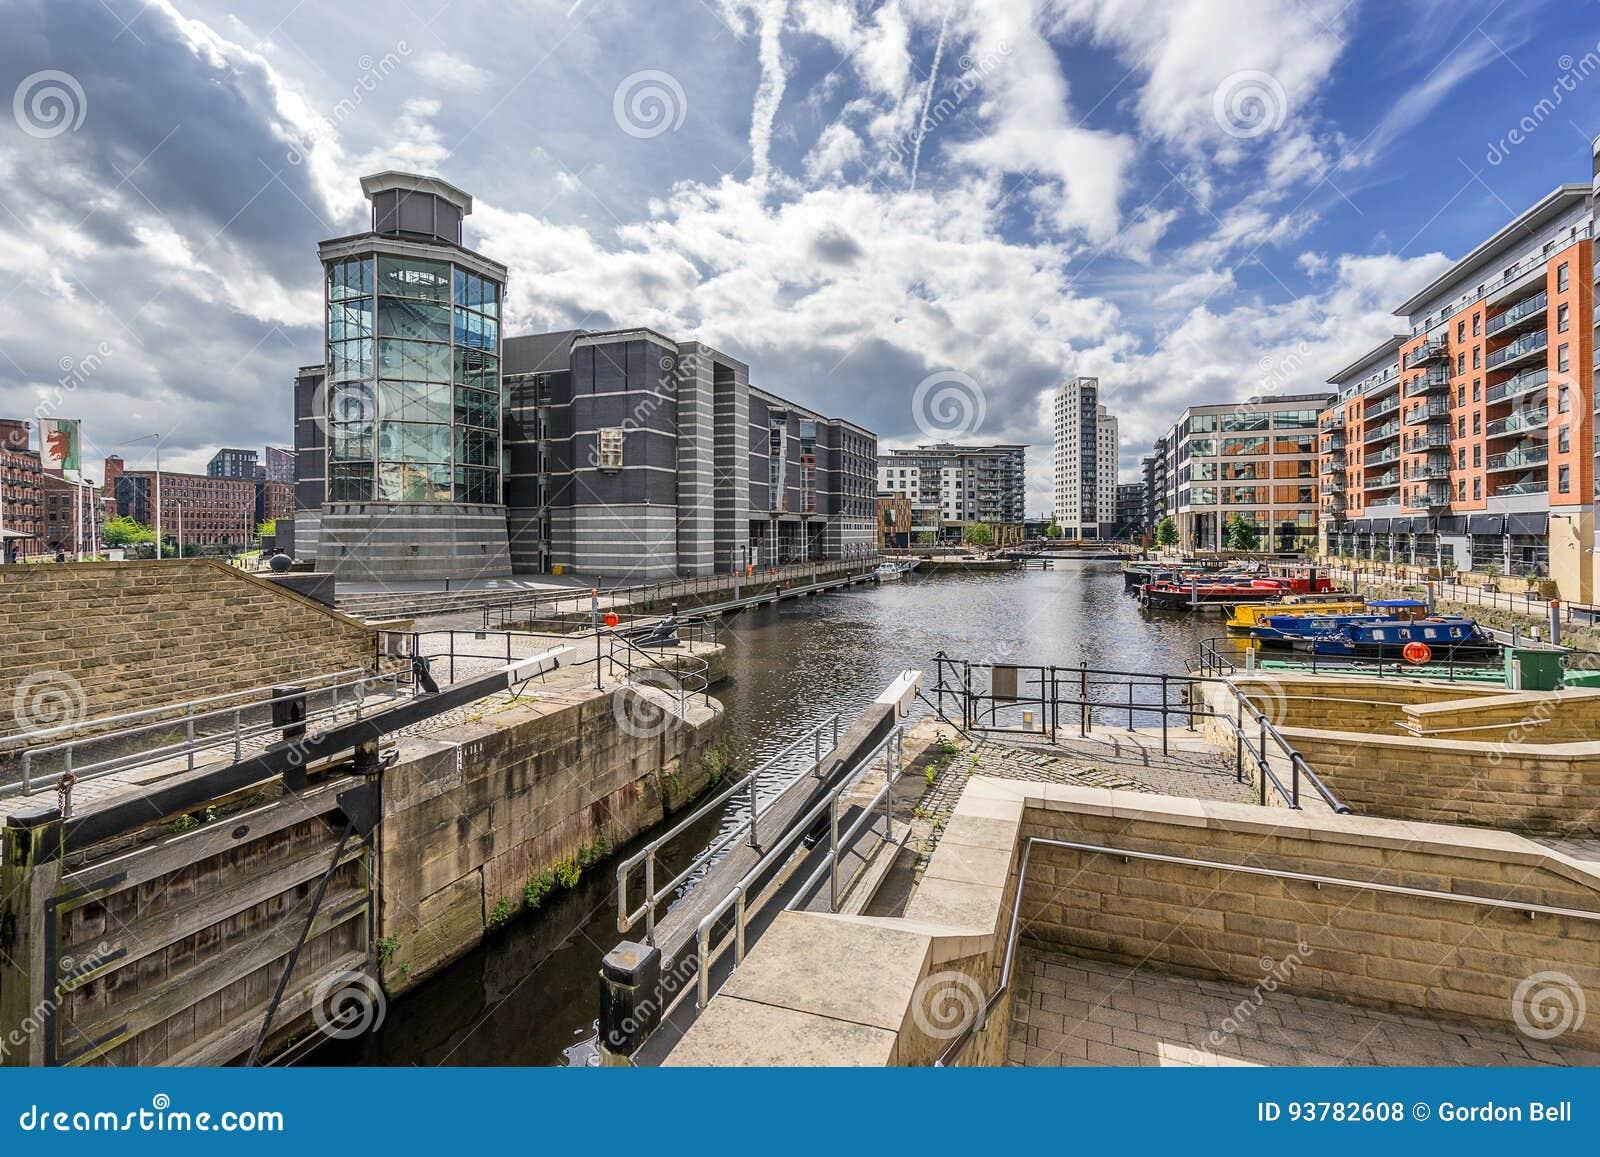 Muelle de Leeds en la ciudad de Leeds